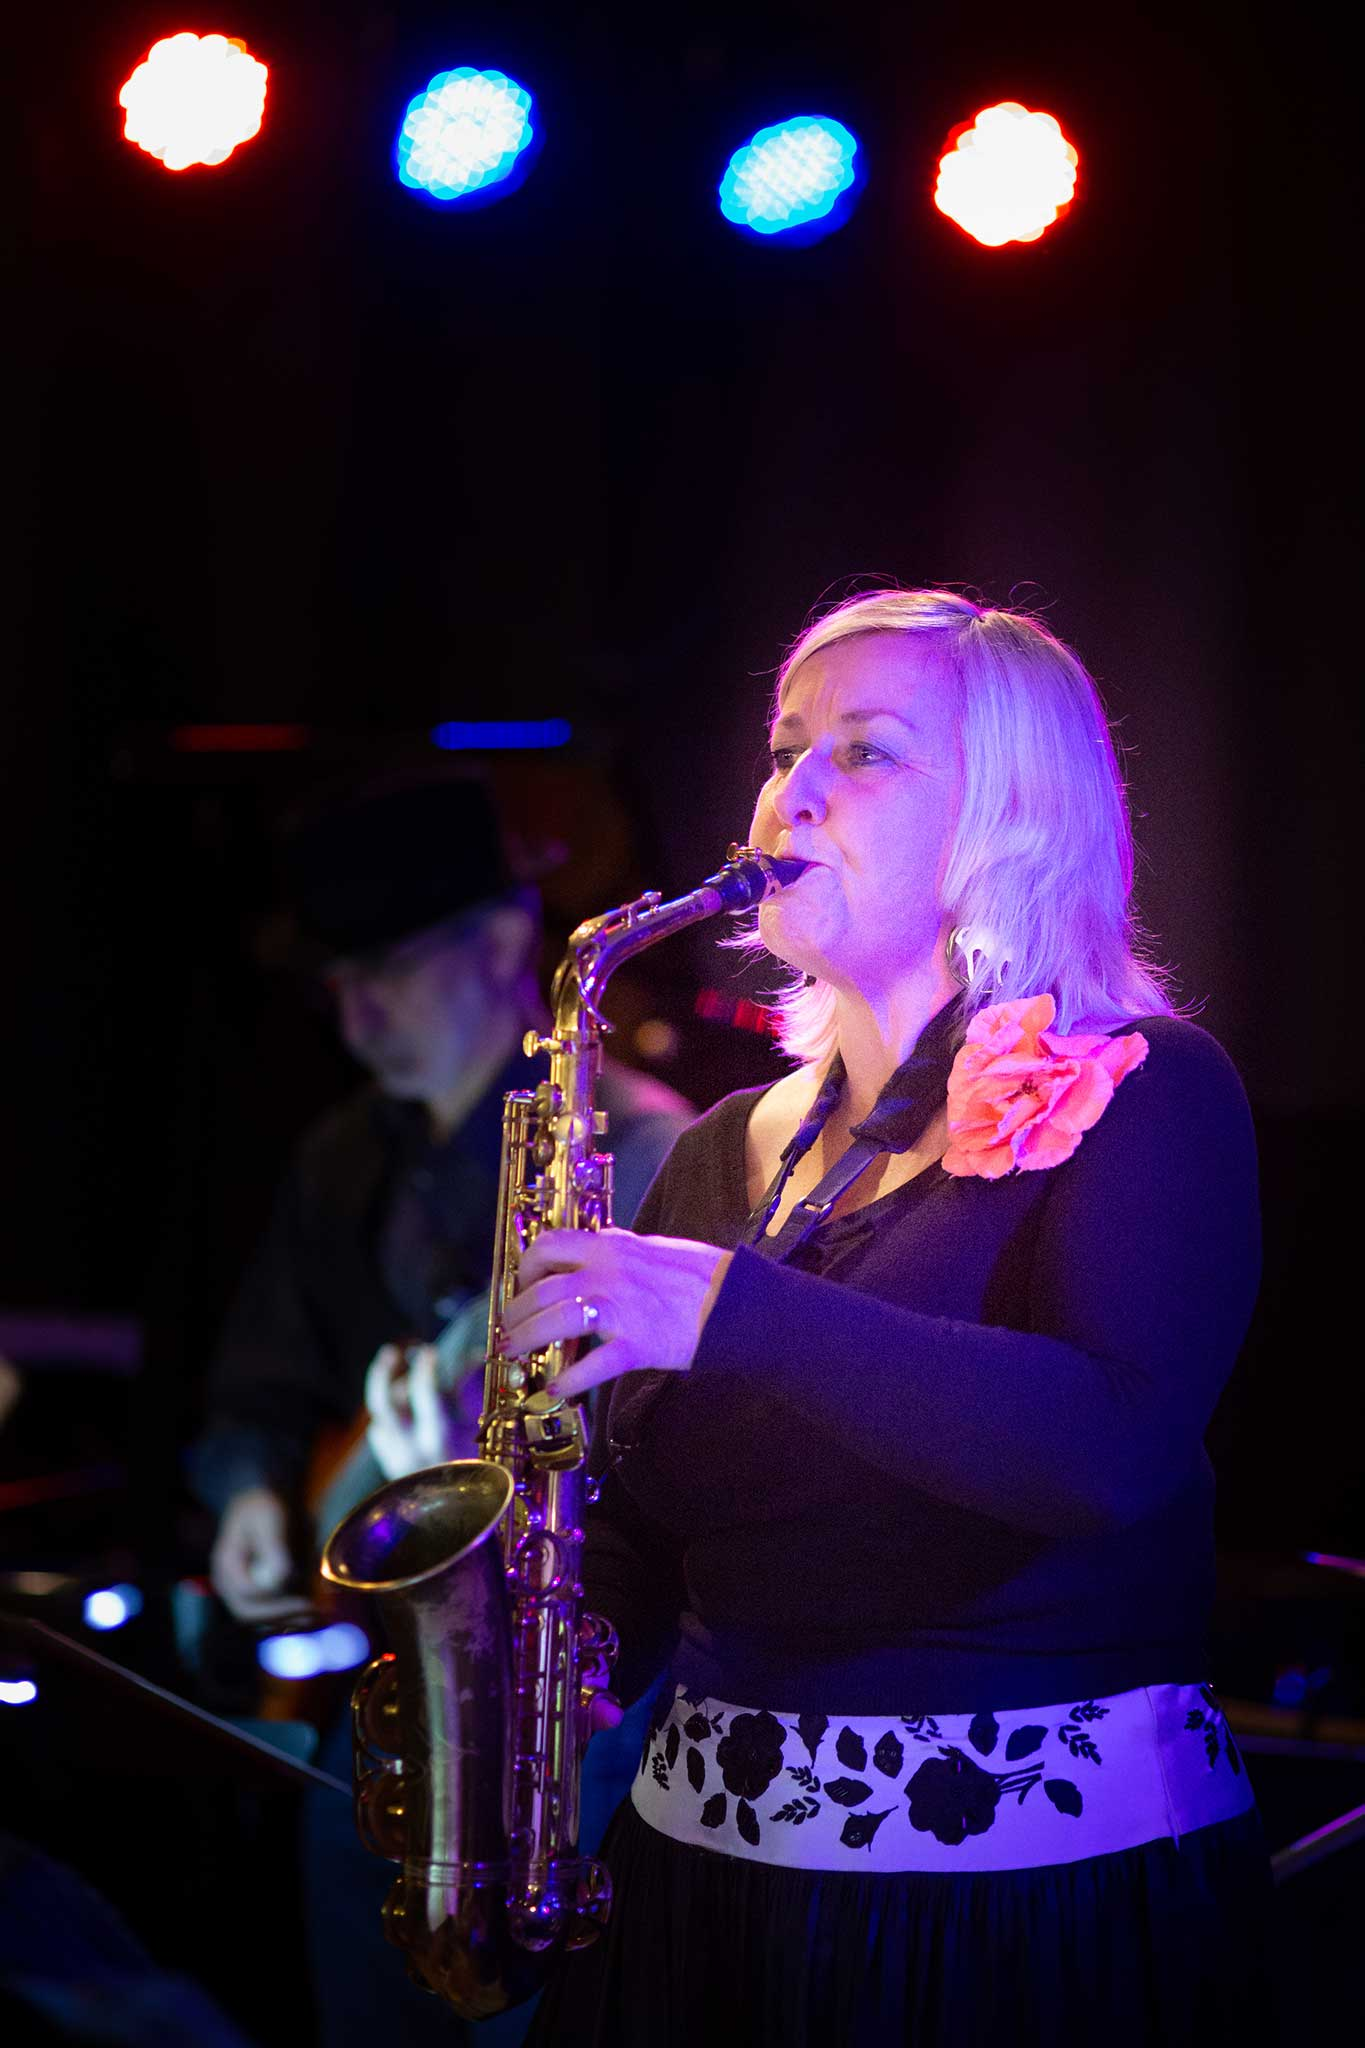 Bettina Scharnowski-Diegel, Altsax+Vocal